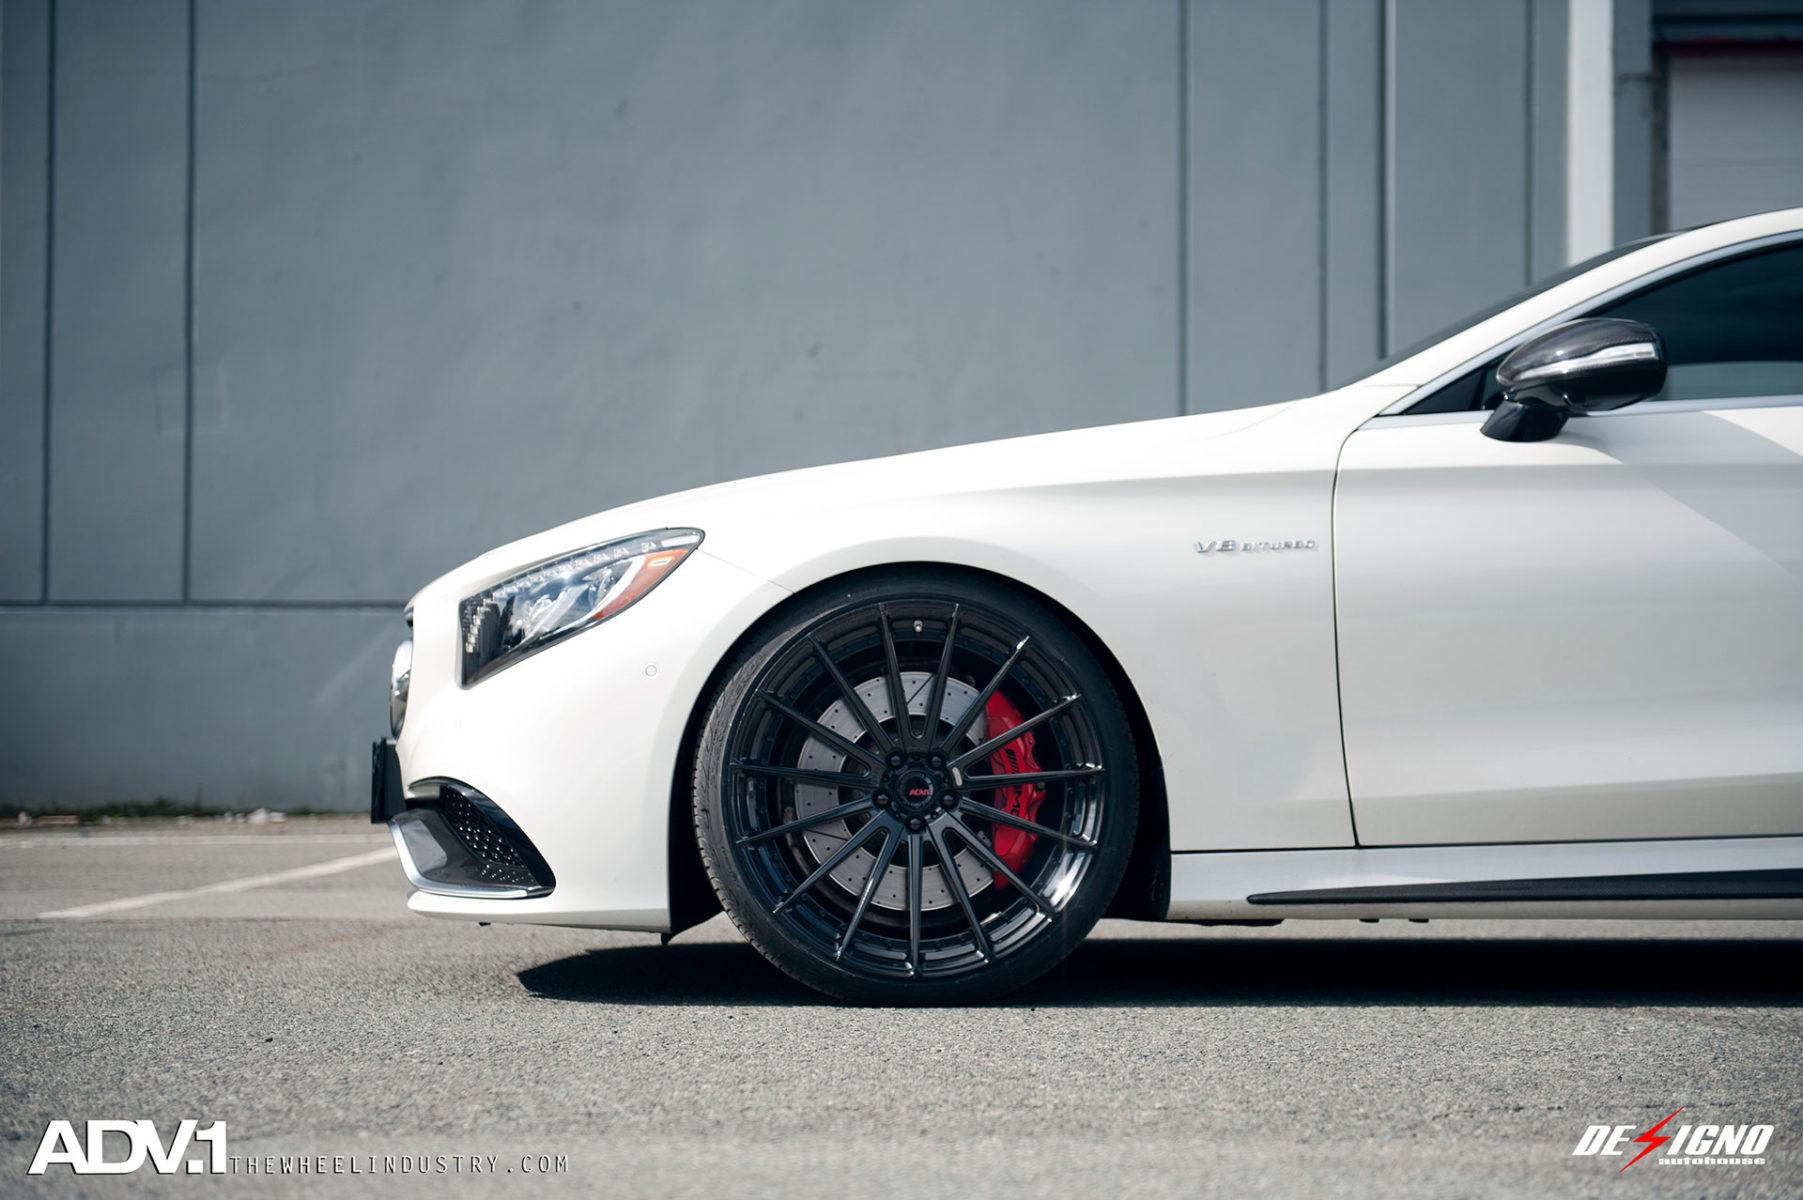 Mercedes-Benz S63 AMG - ADV15 M.V2 SL Series Forged Wheels